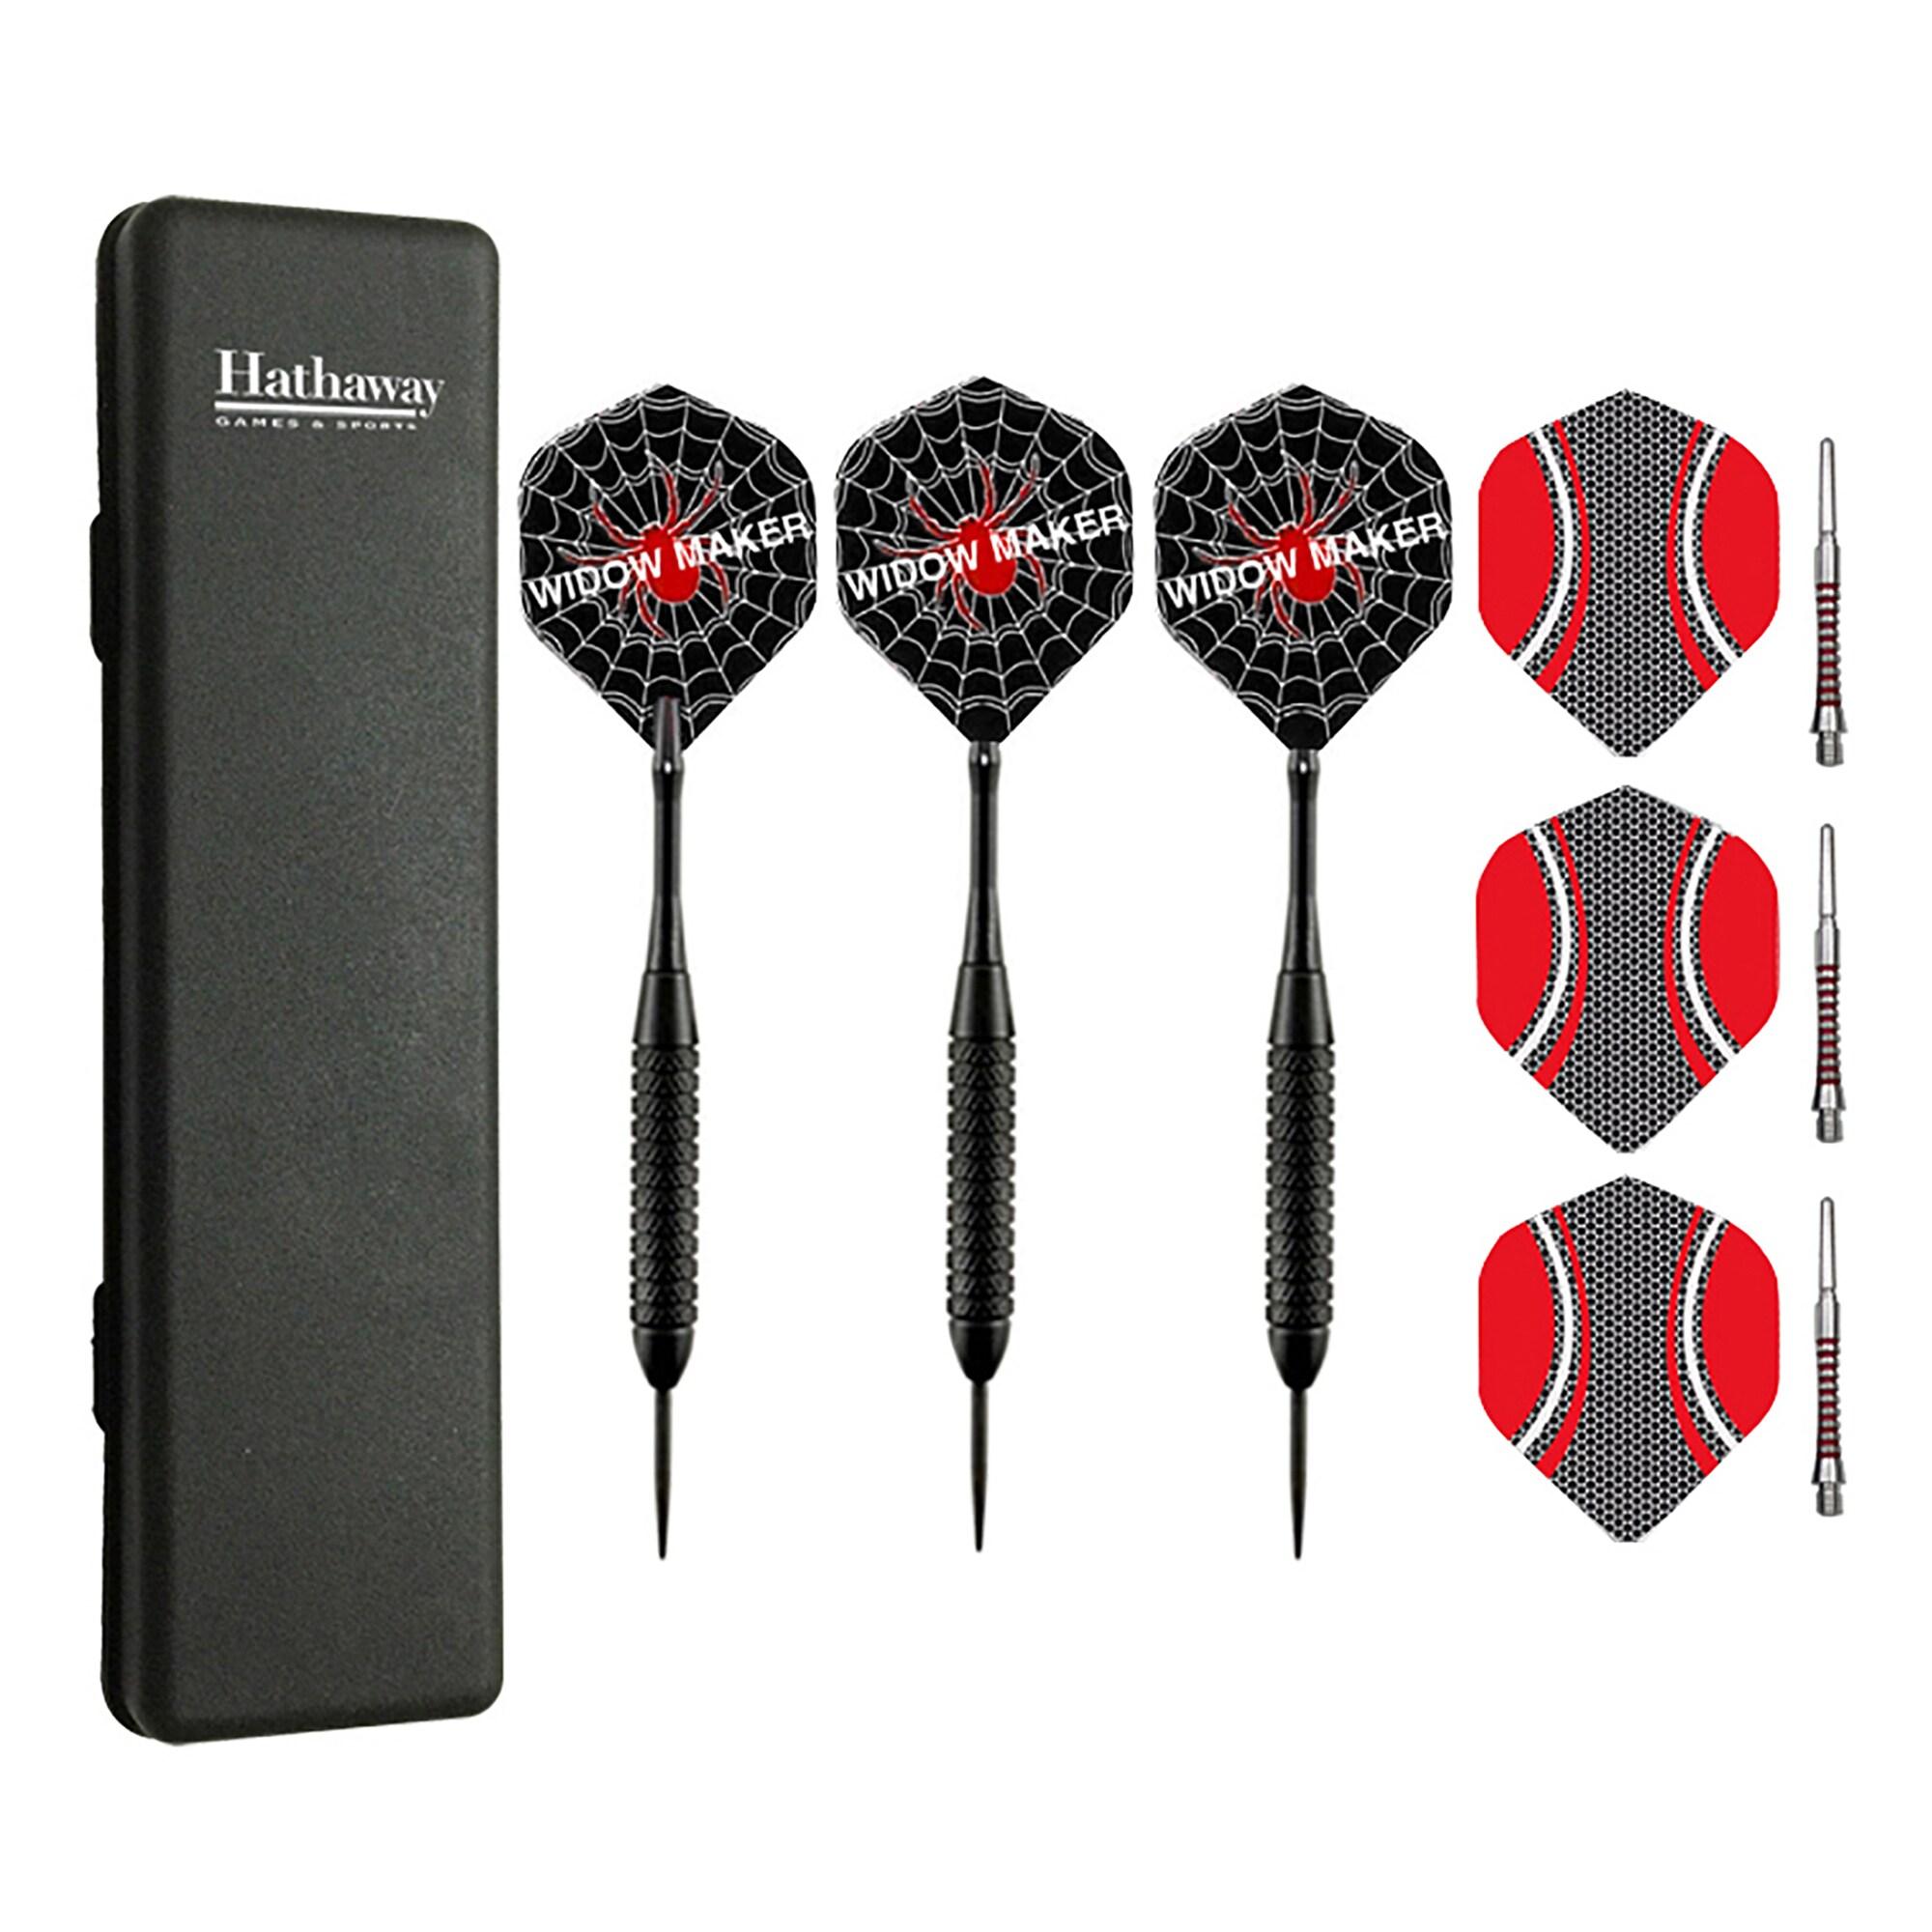 Hathaway Widow Maker Steel (Silver) Tip Darts (Set of 3) ...